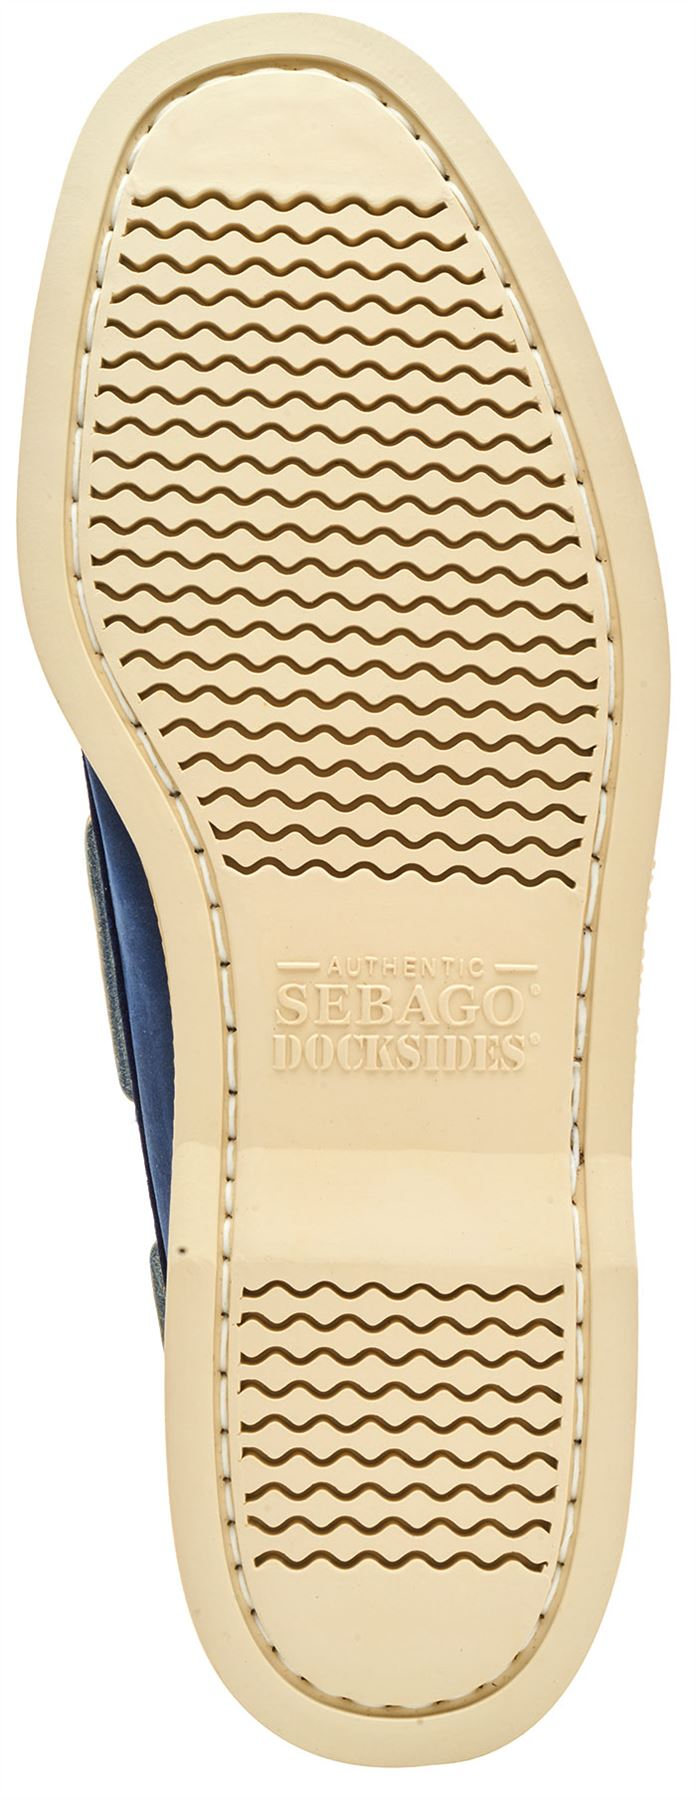 Sebago-Docksides-NBK-Suede-Boat-Deck-Shoes-in-Navy-Blue-amp-Coral-amp-Dark-Brown thumbnail 41